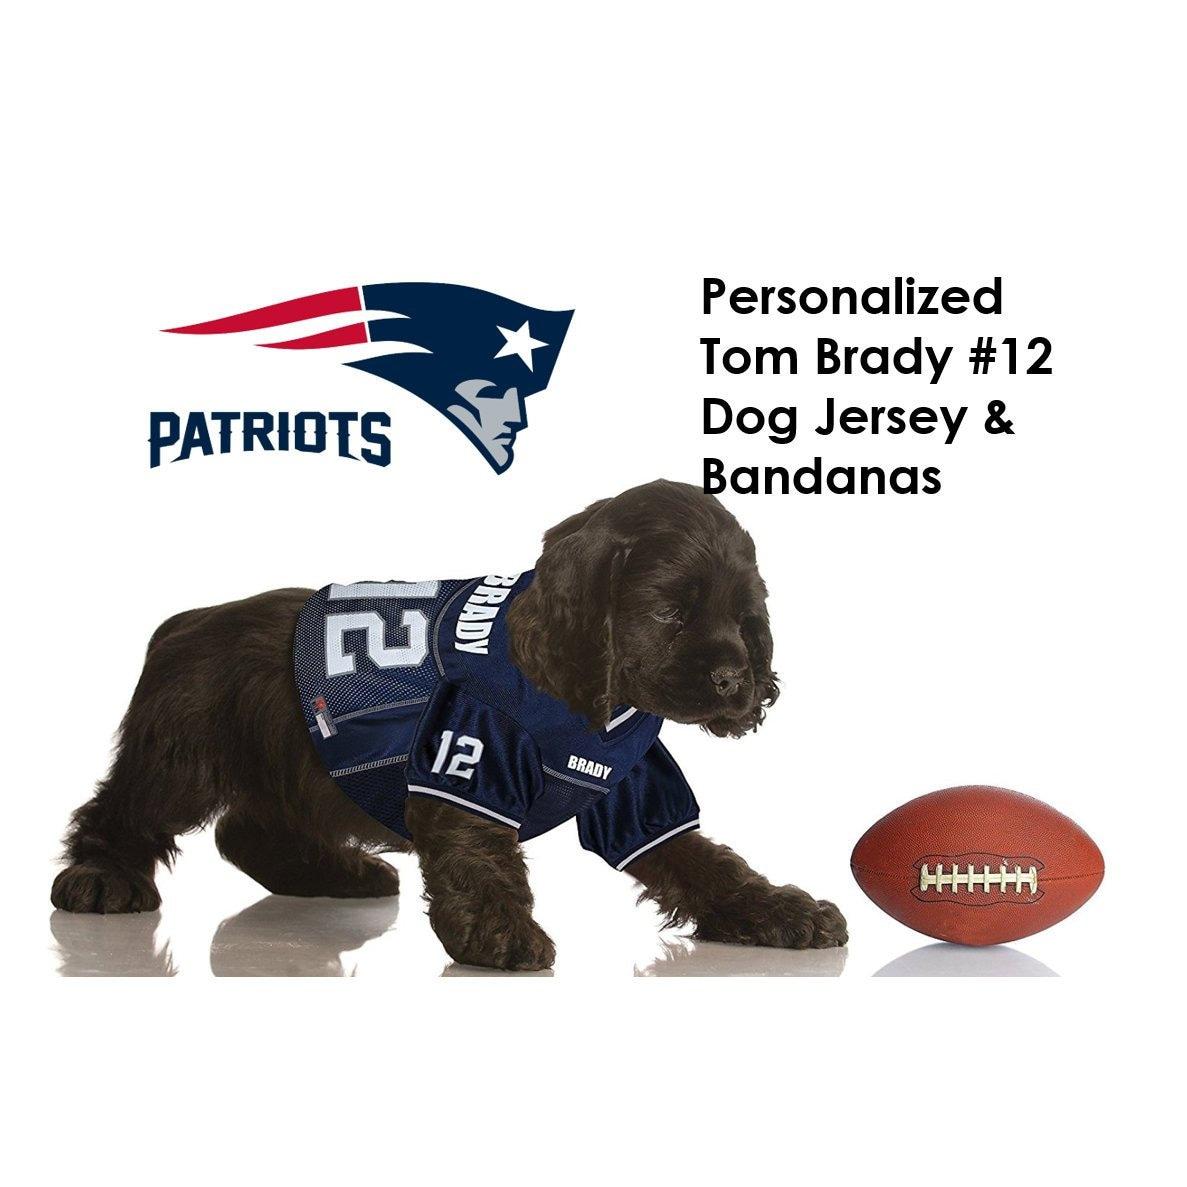 5bb6ead64bc Tom Brady New England Patriots Pet Dog Jersey Personalized | Etsy